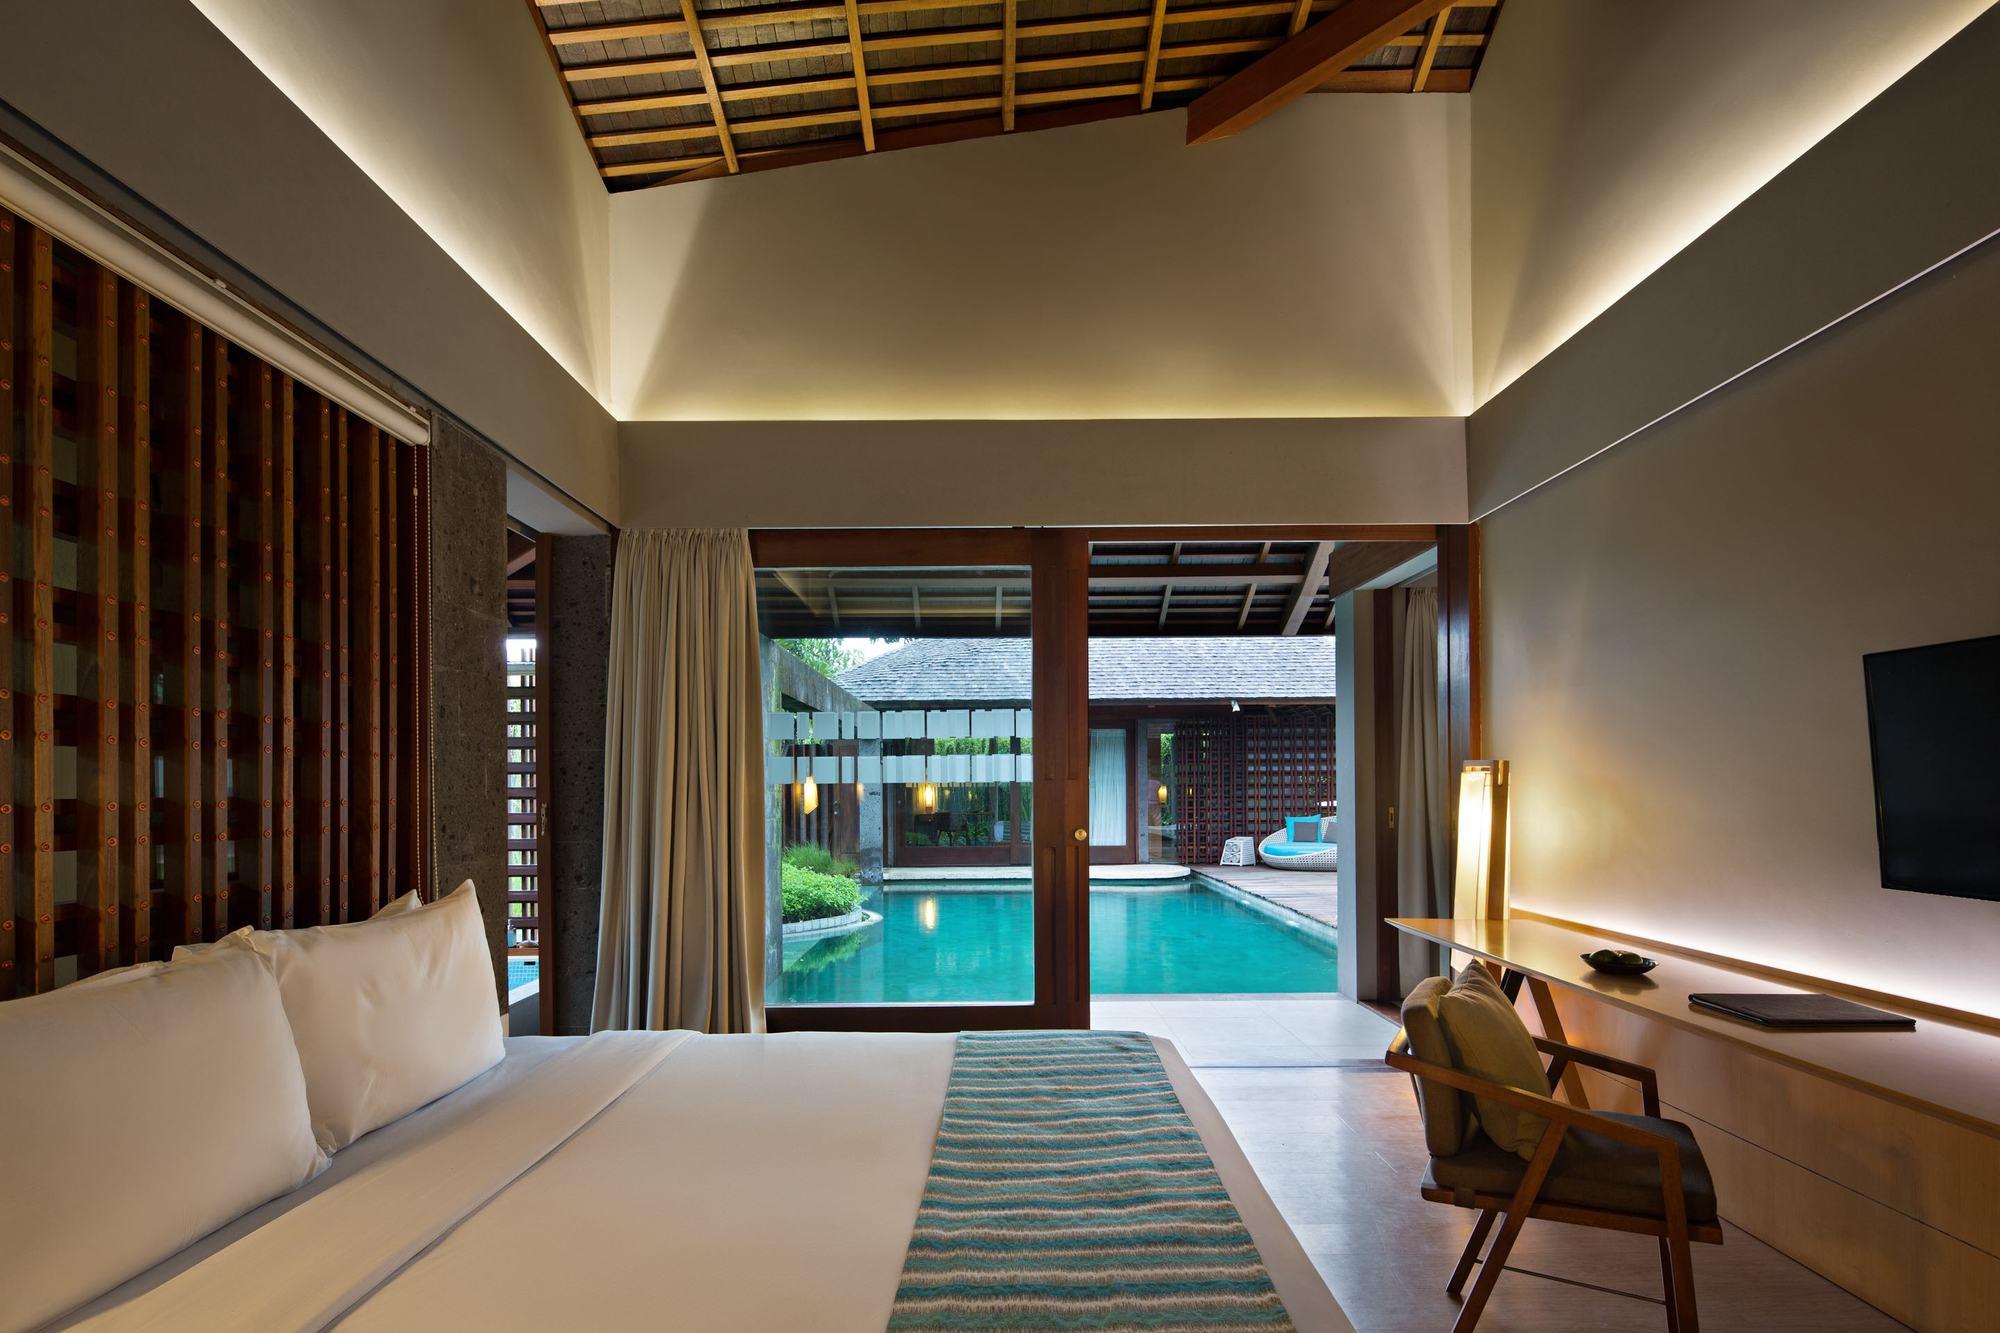 galer a de the santai antony liu architects studio tonton 10. Black Bedroom Furniture Sets. Home Design Ideas